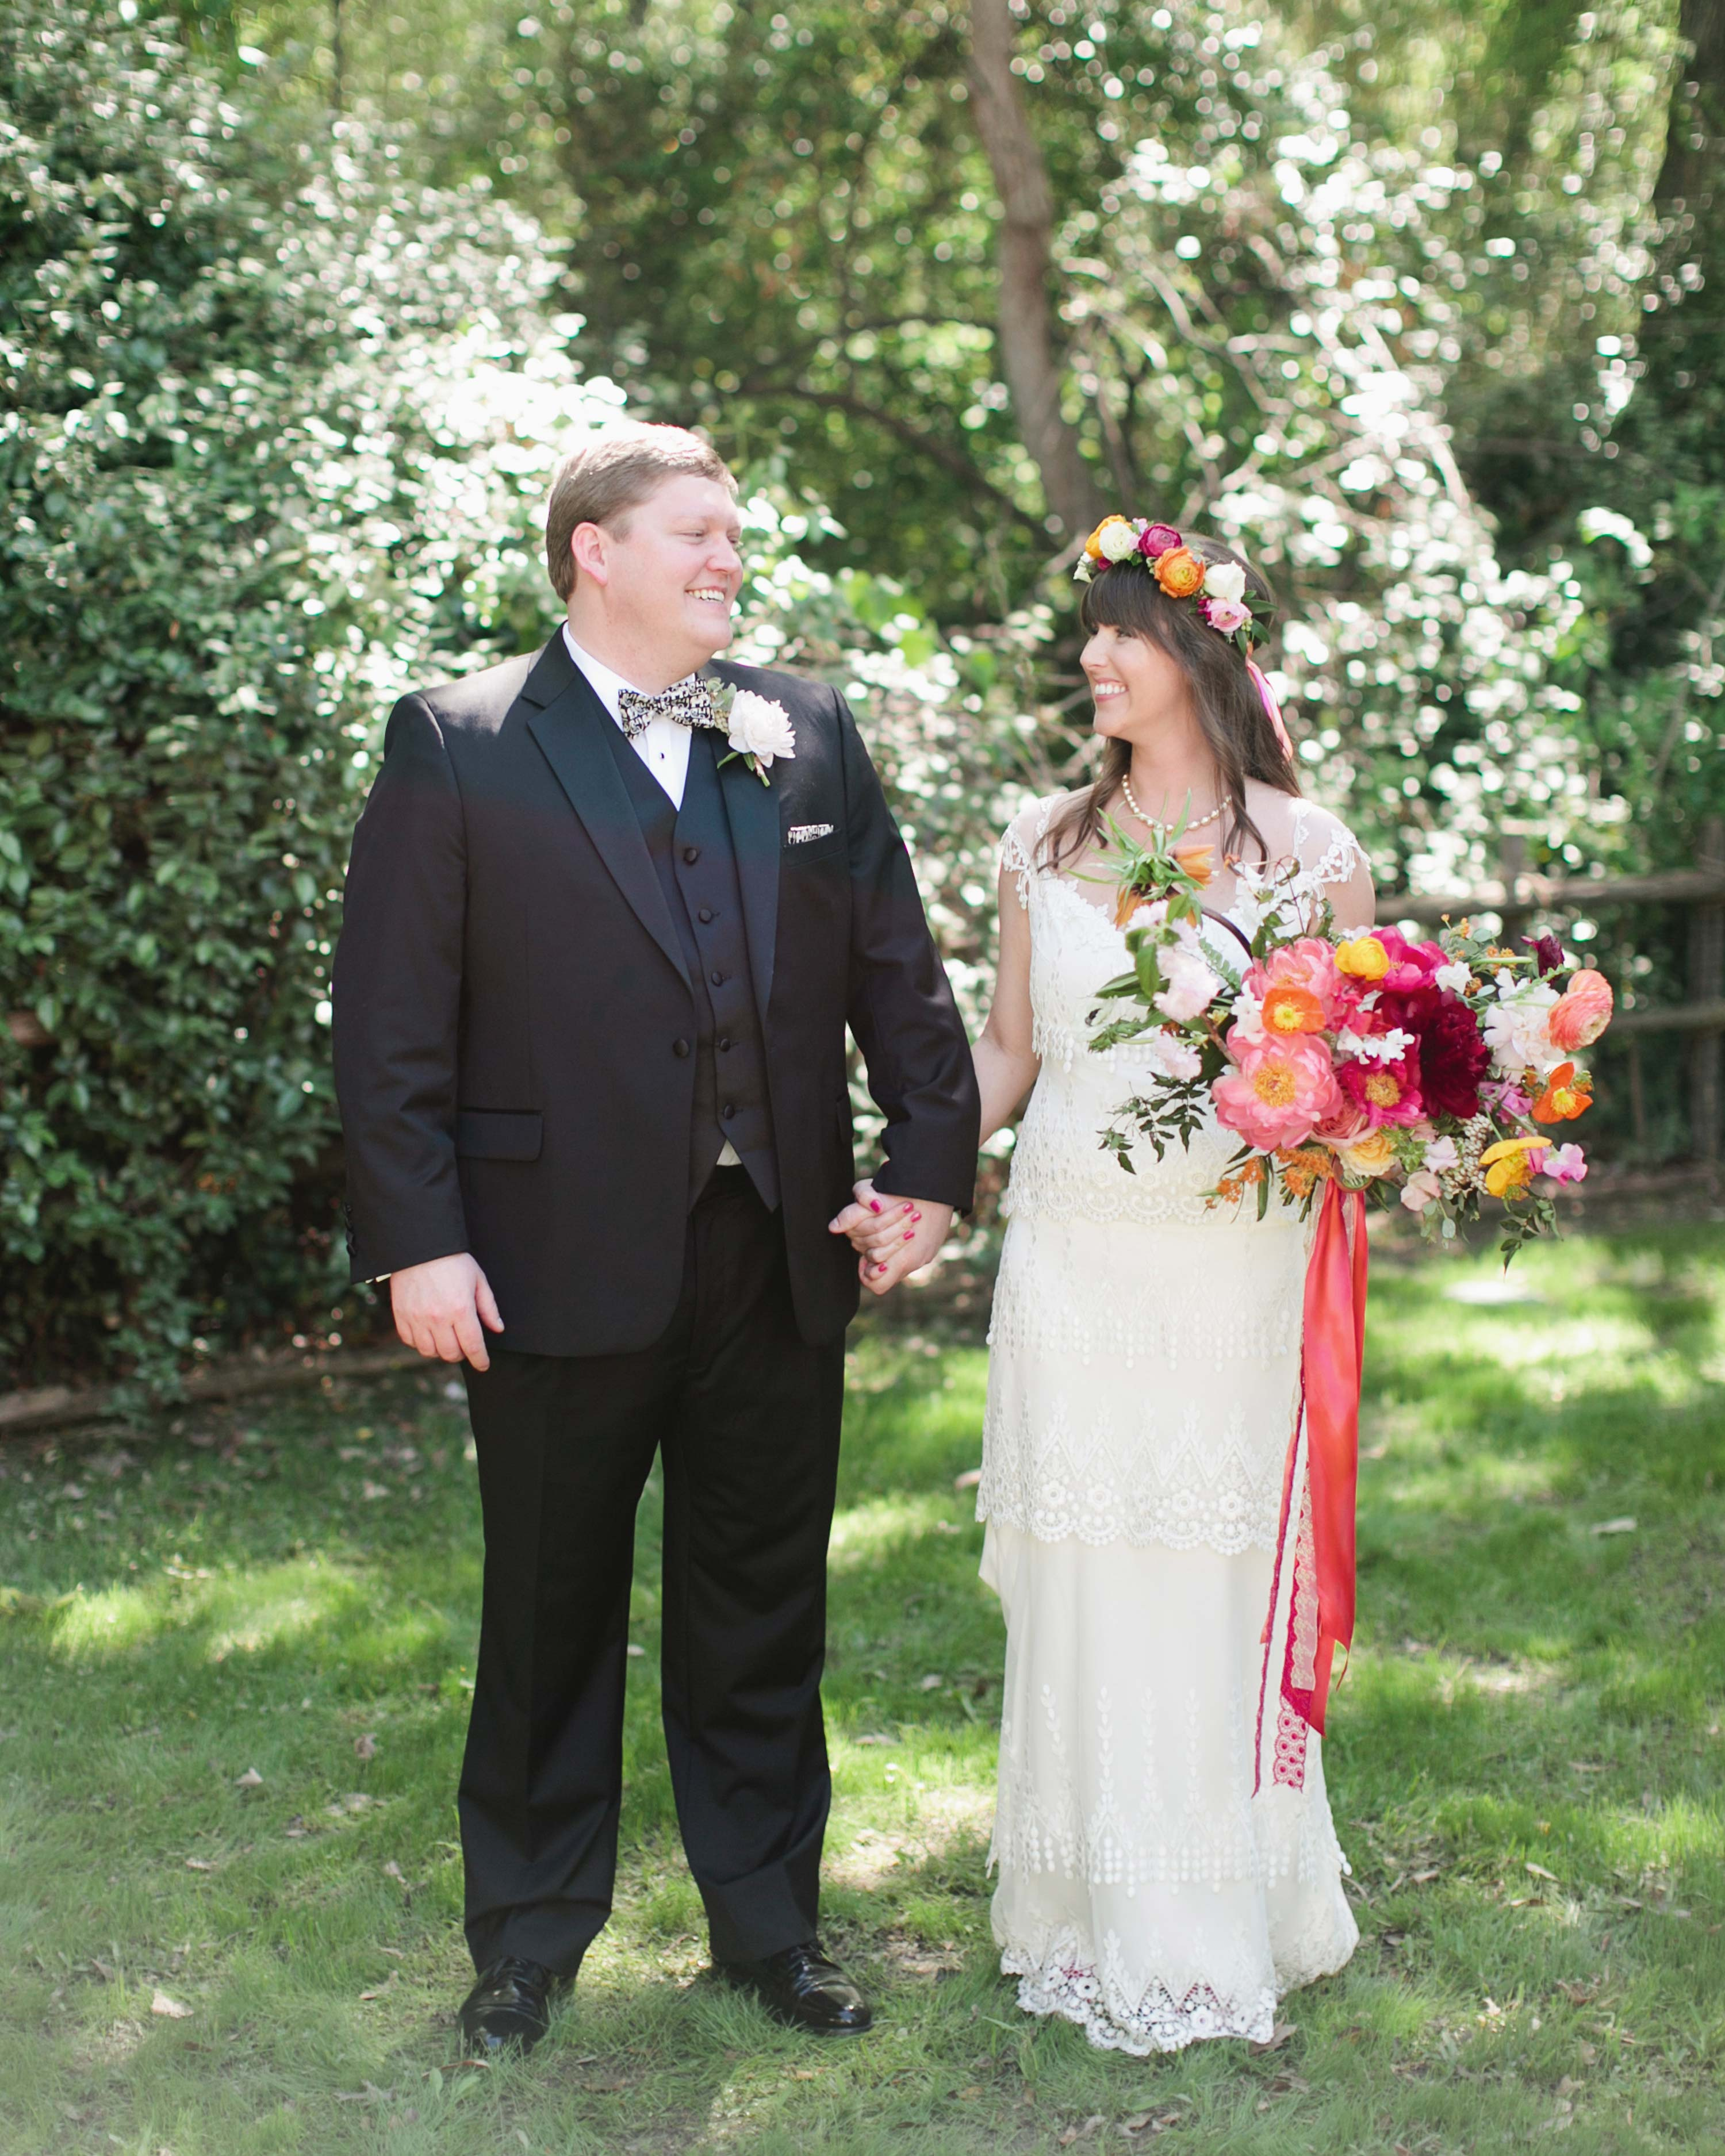 holly-john-wedding-texas-couple-025-s112833-0516.jpg